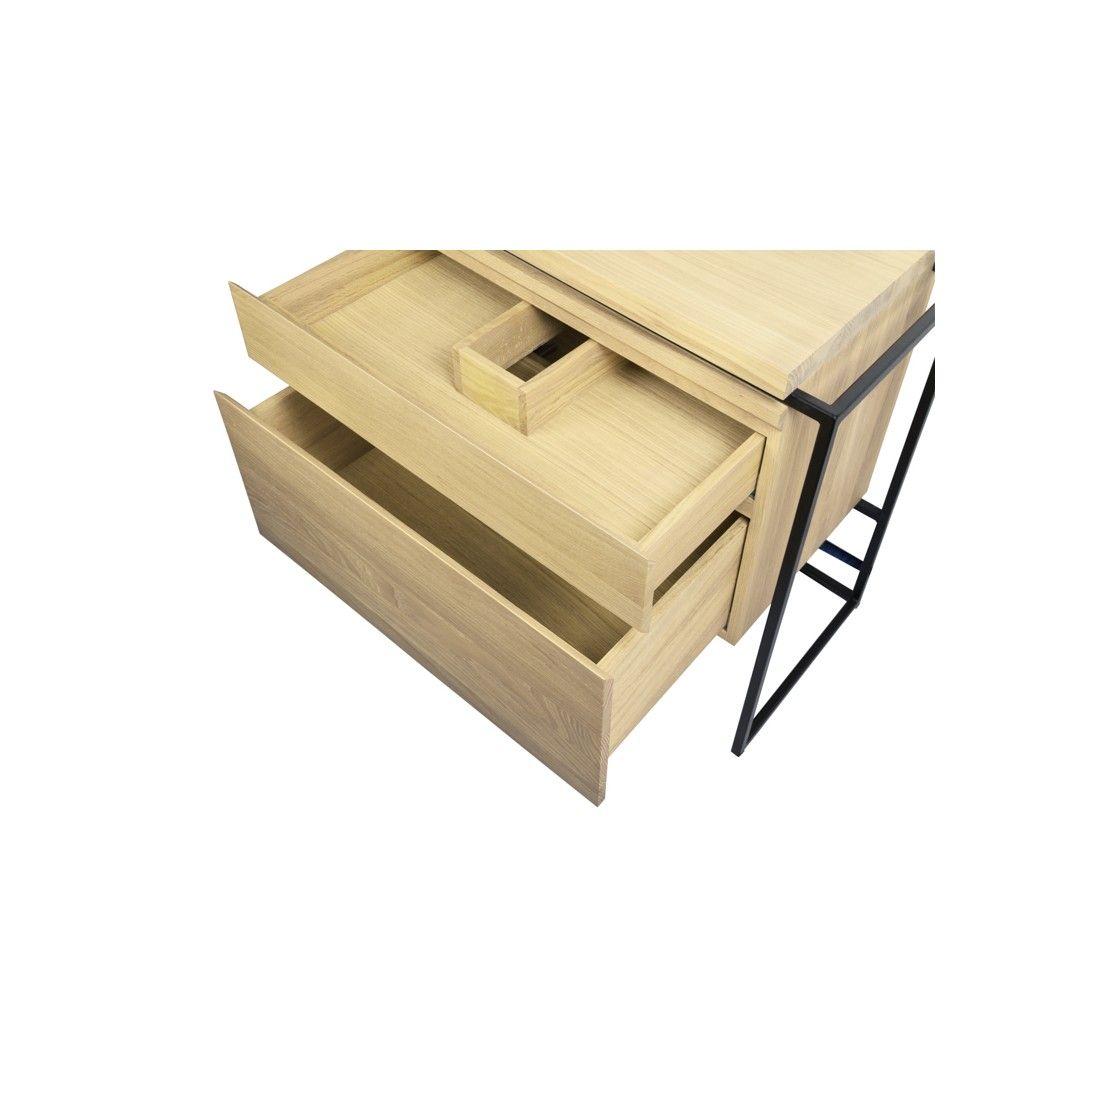 Meuble vasque en chêne avec tiroir style vintage